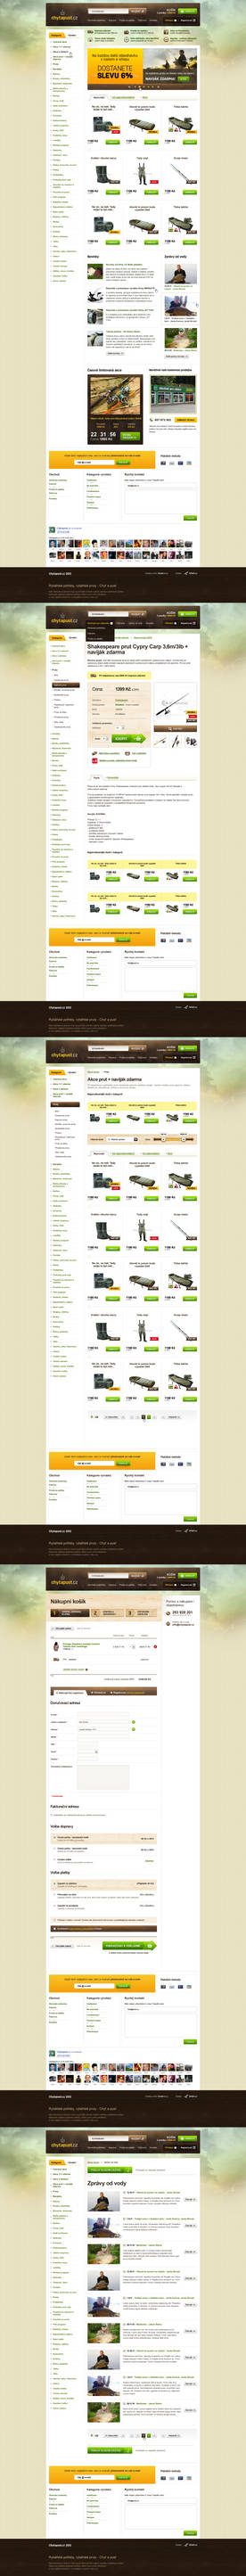 E-commerce fishing gear